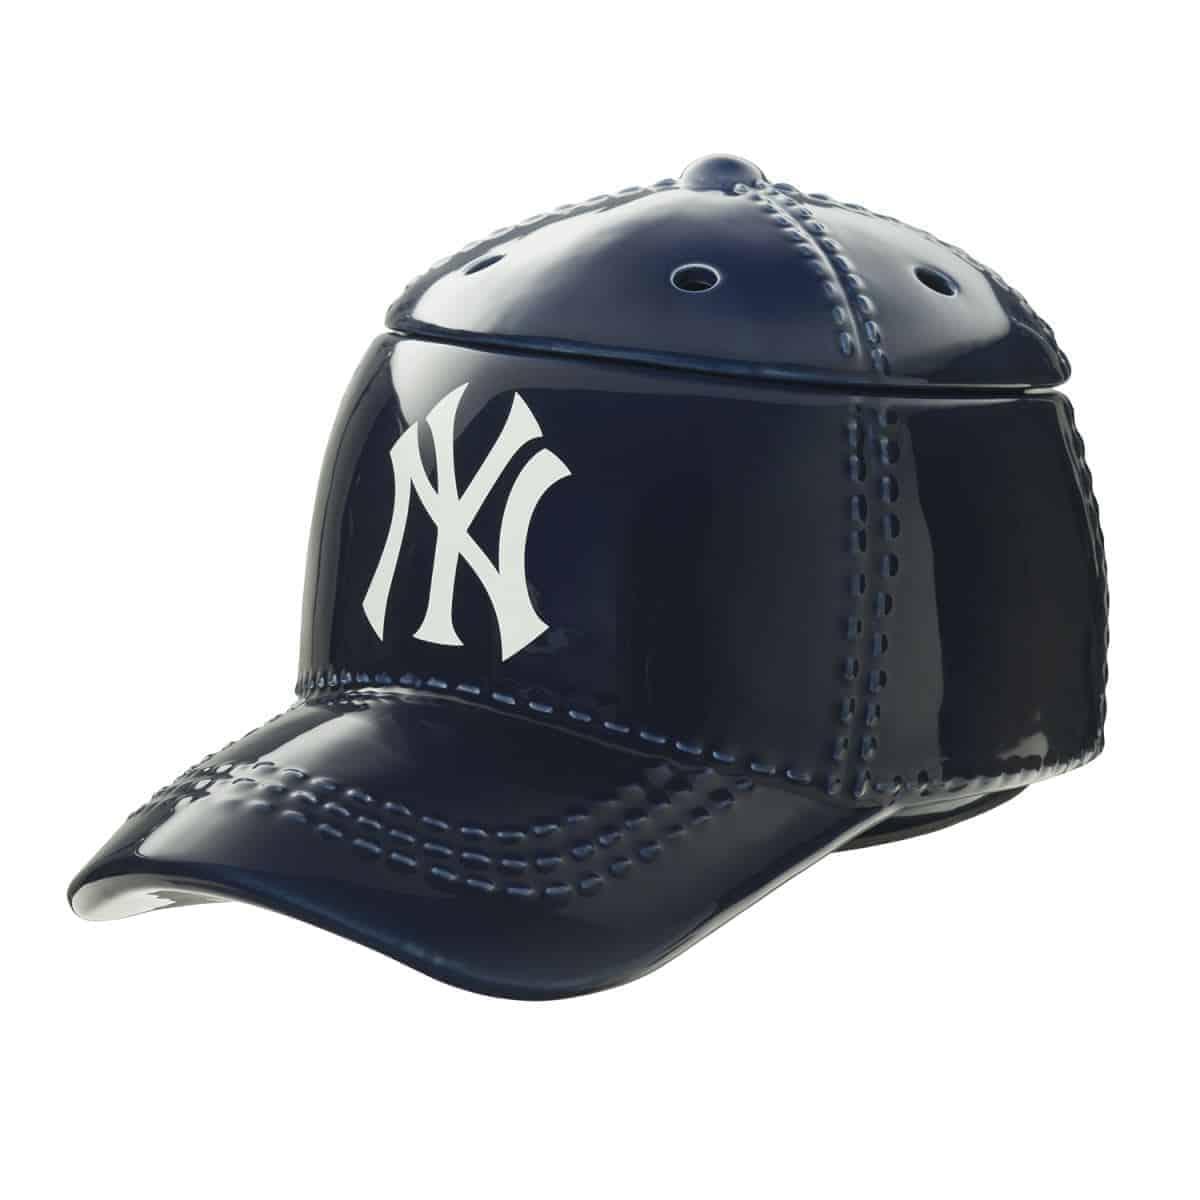 New York Baseball Cap Scentsy Warmer